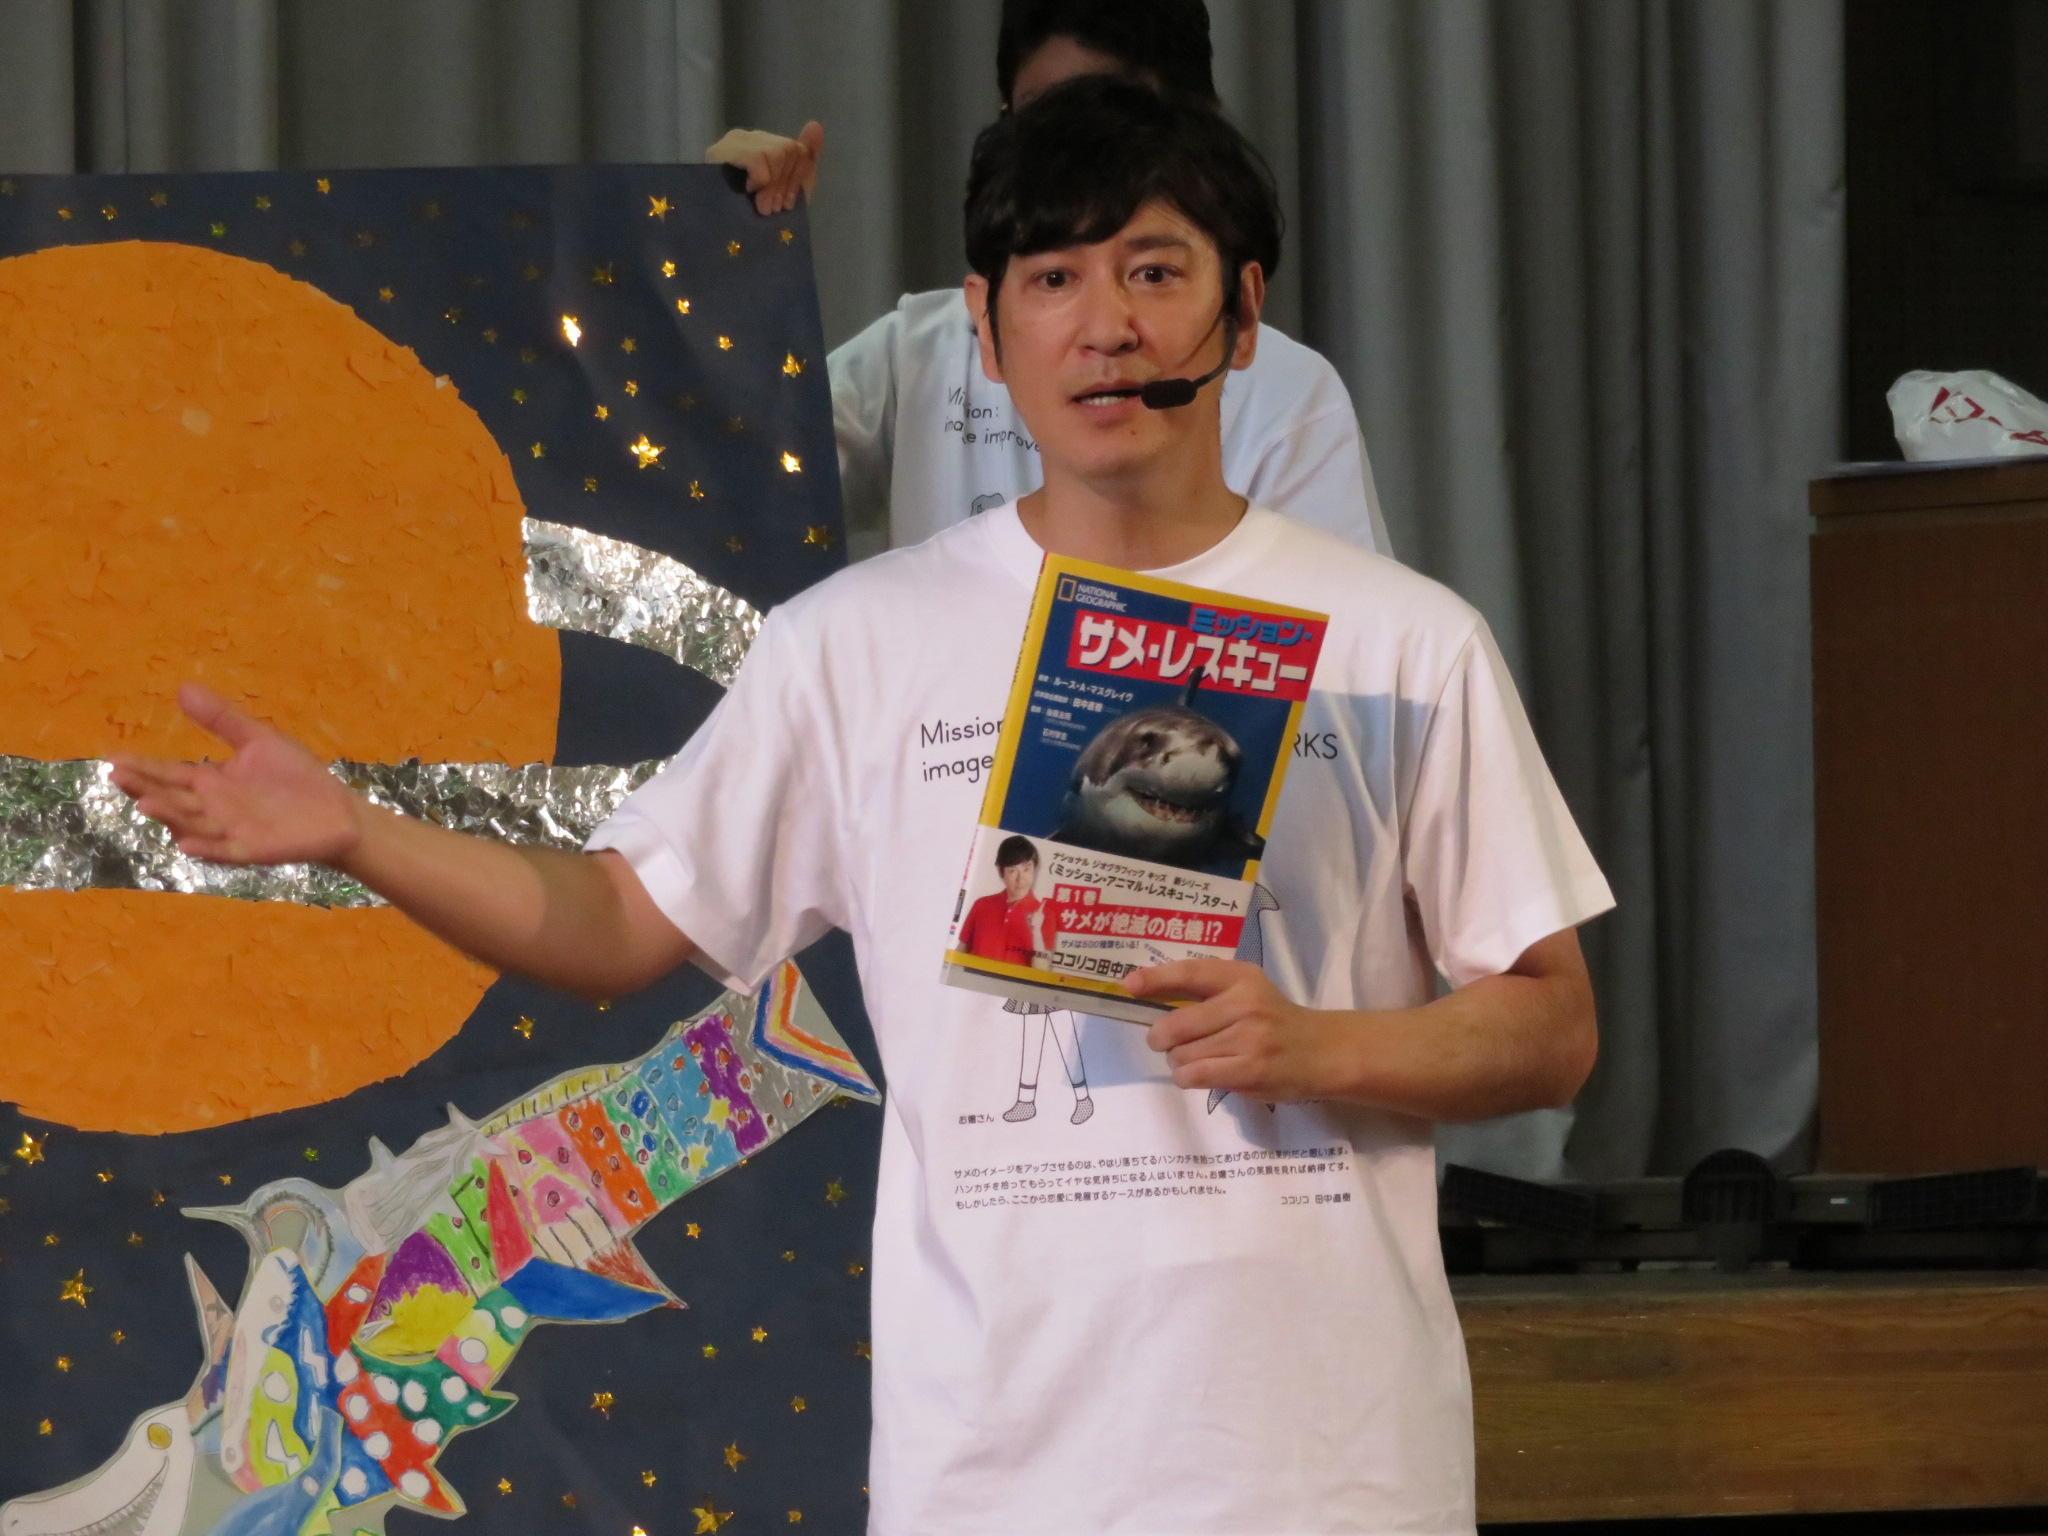 http://news.yoshimoto.co.jp/20181010023332-80c26a1aa943a0a8986834731cee974e35345231.jpg